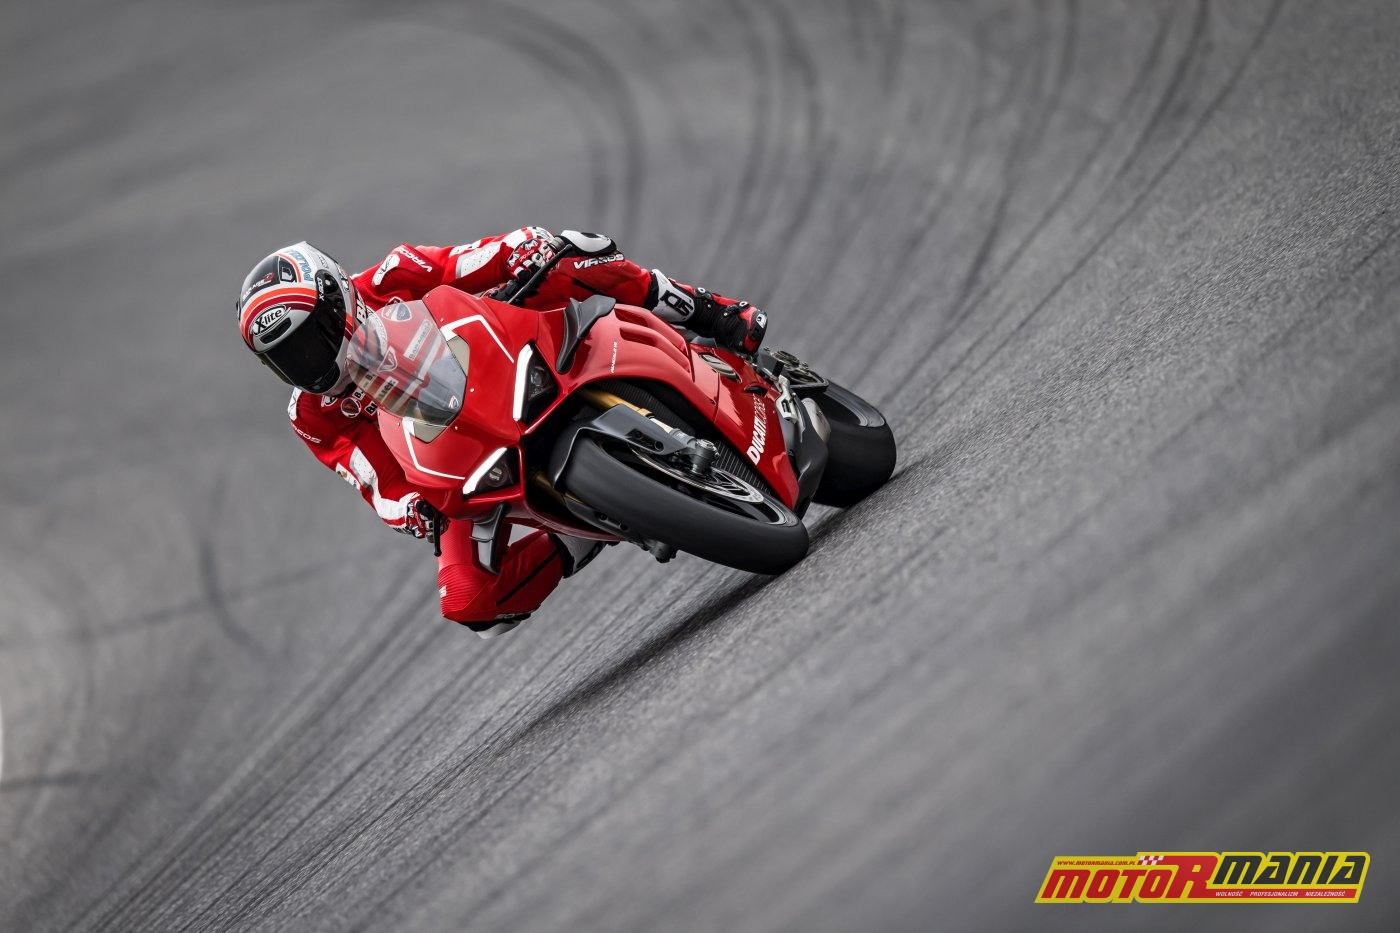 Ducati Panigale V4 R 2019 (38)